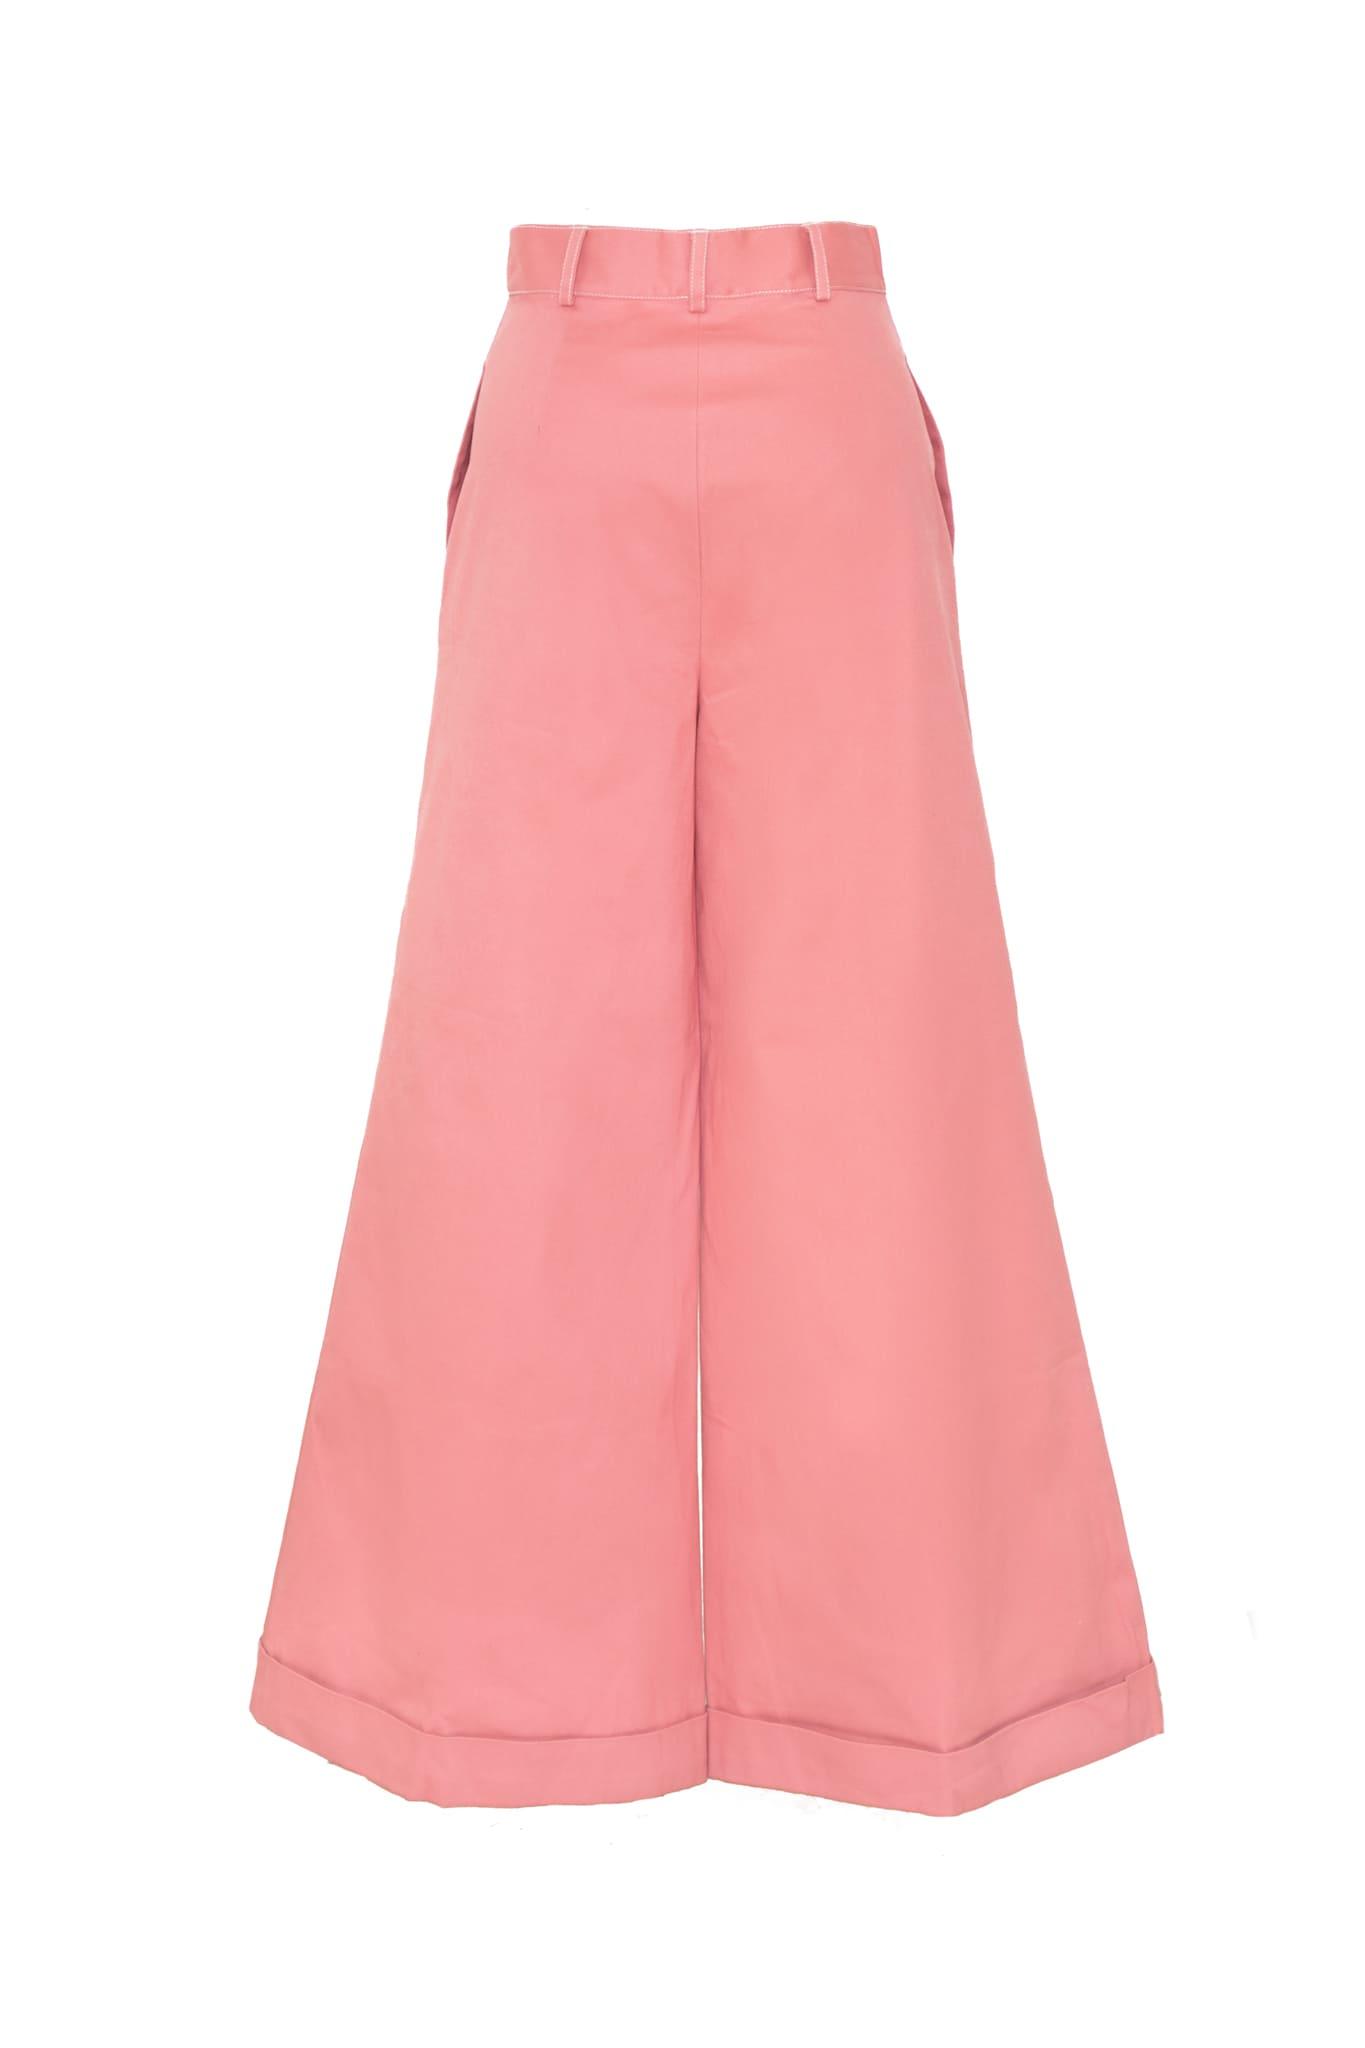 ropa-pantalon-the-optimistic-anniehc-atizz (2)